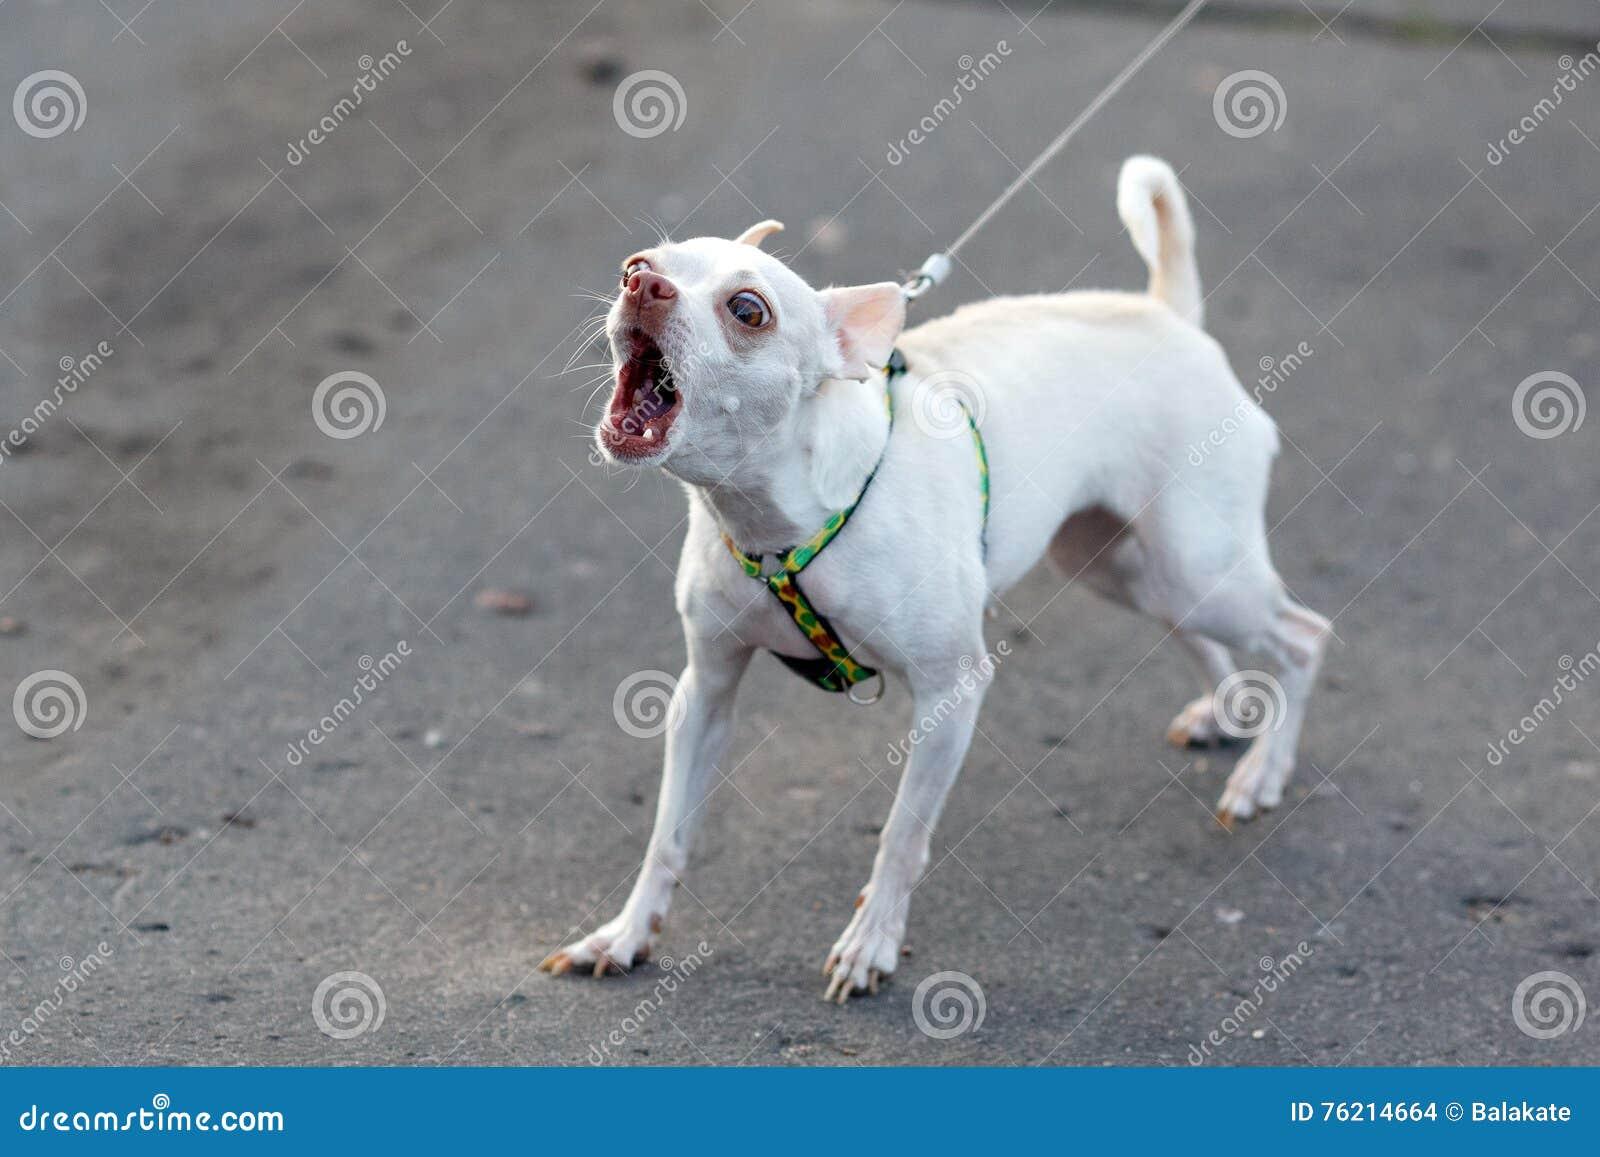 Chihuahua Dog Barking Sounds